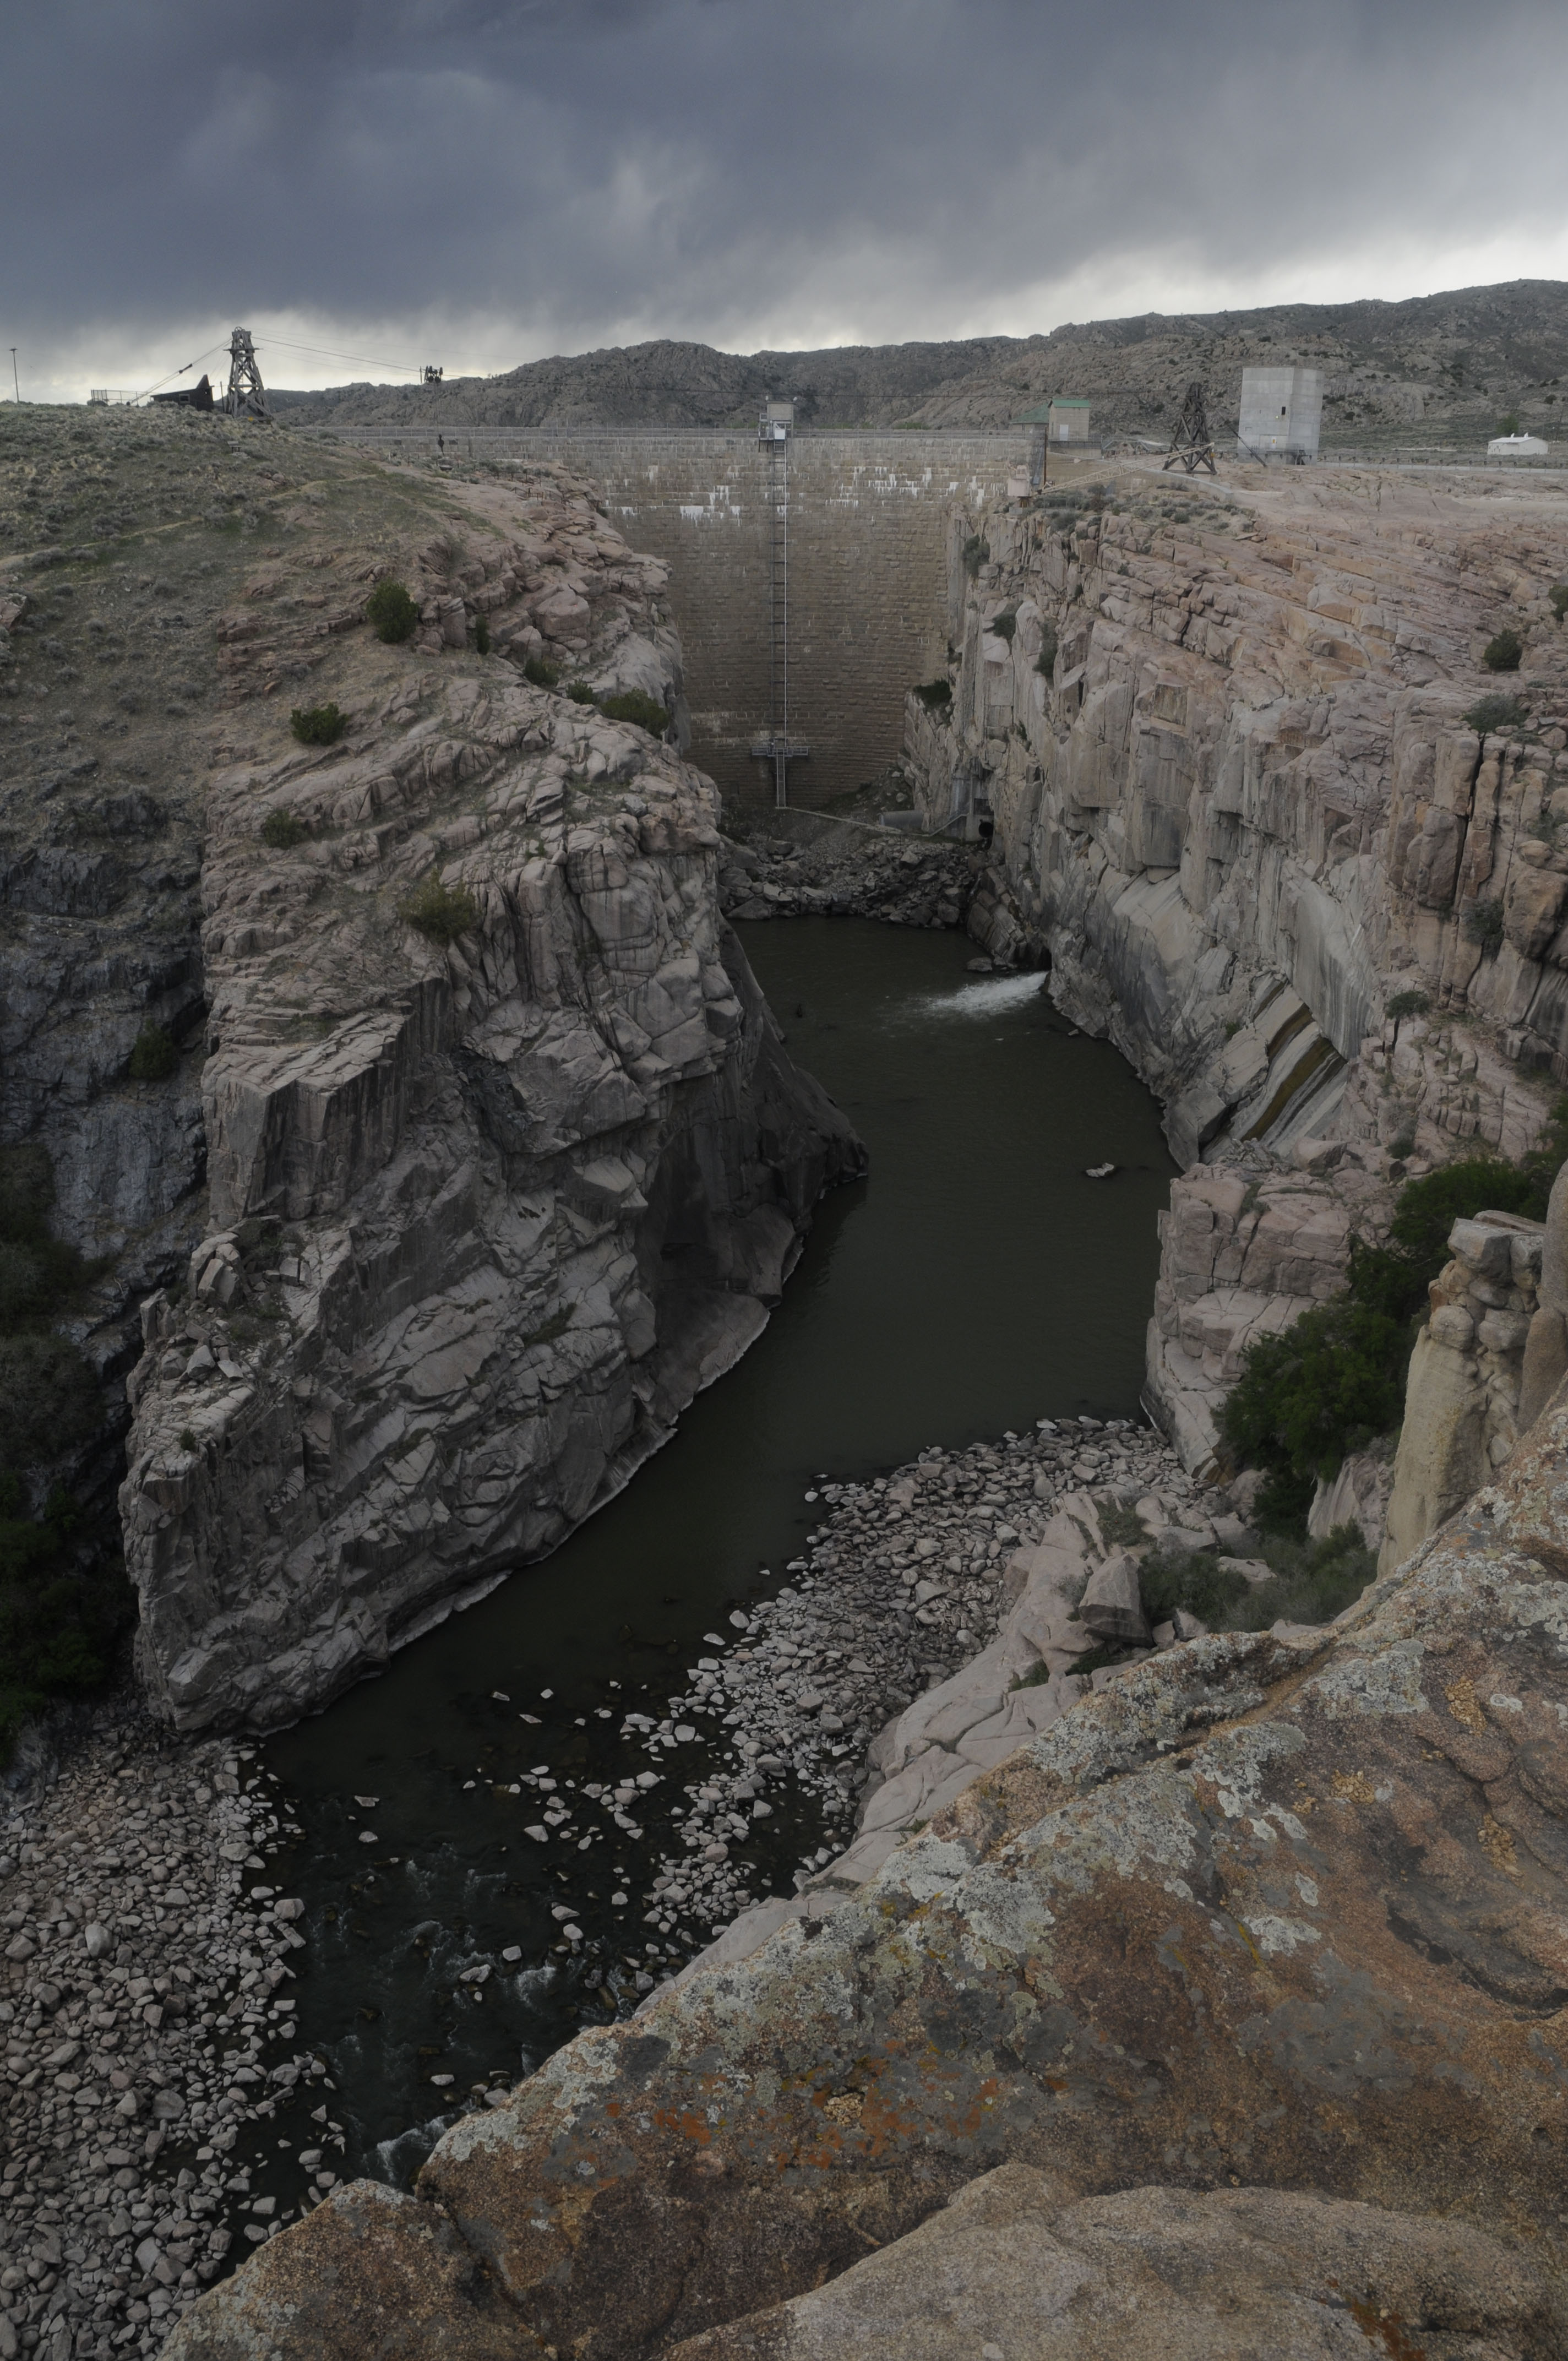 Pathfinder Dam on the North Platte River. (Michael Farrell)